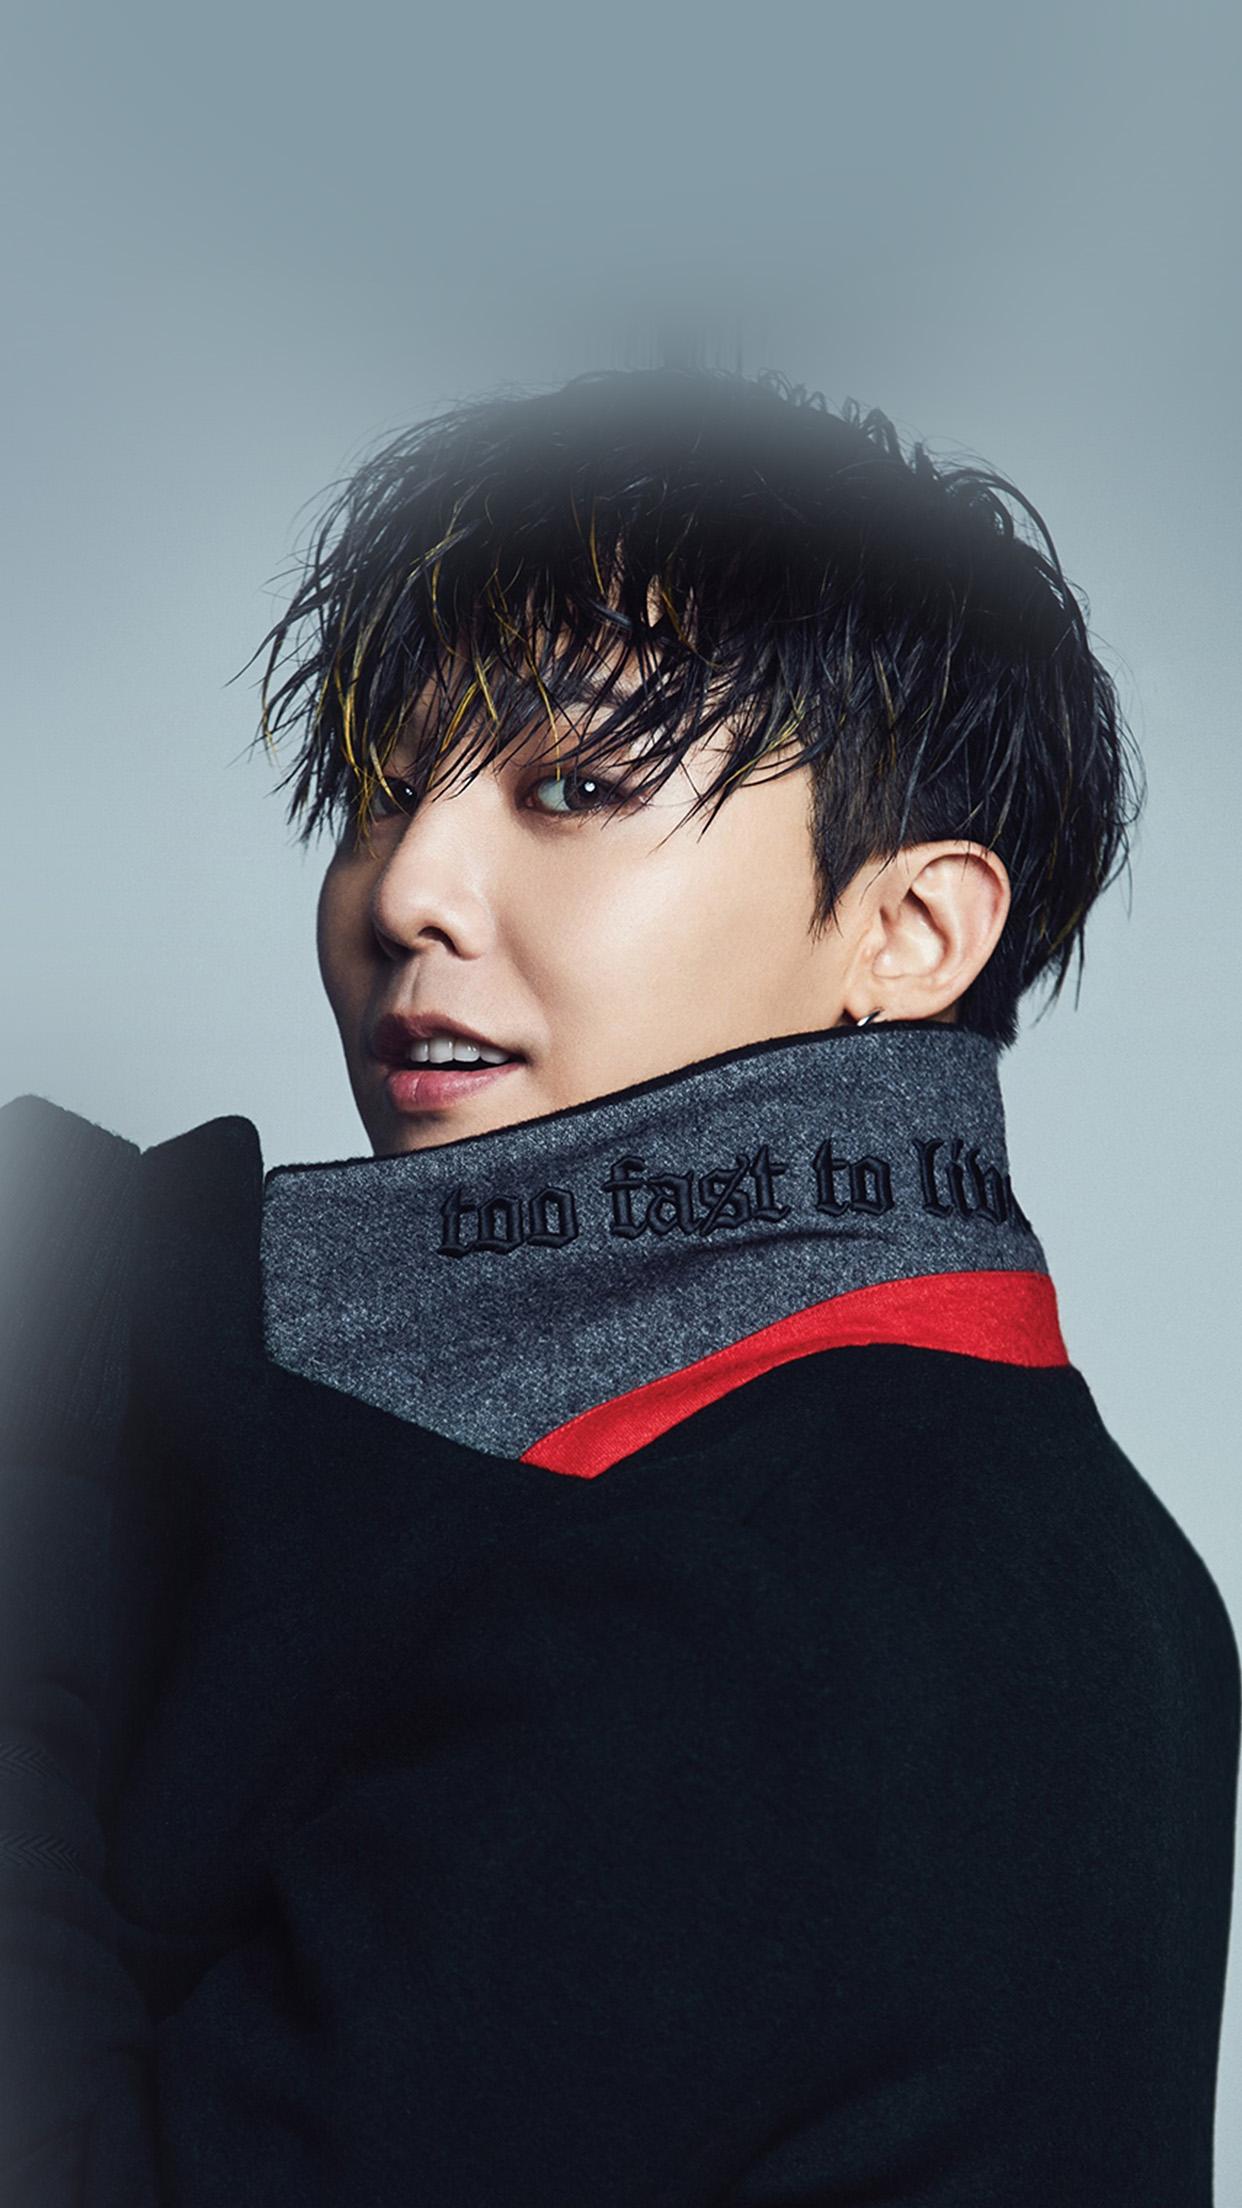 Gdragon Bigbang Kpop Singer Android Wallpaper Android Hd